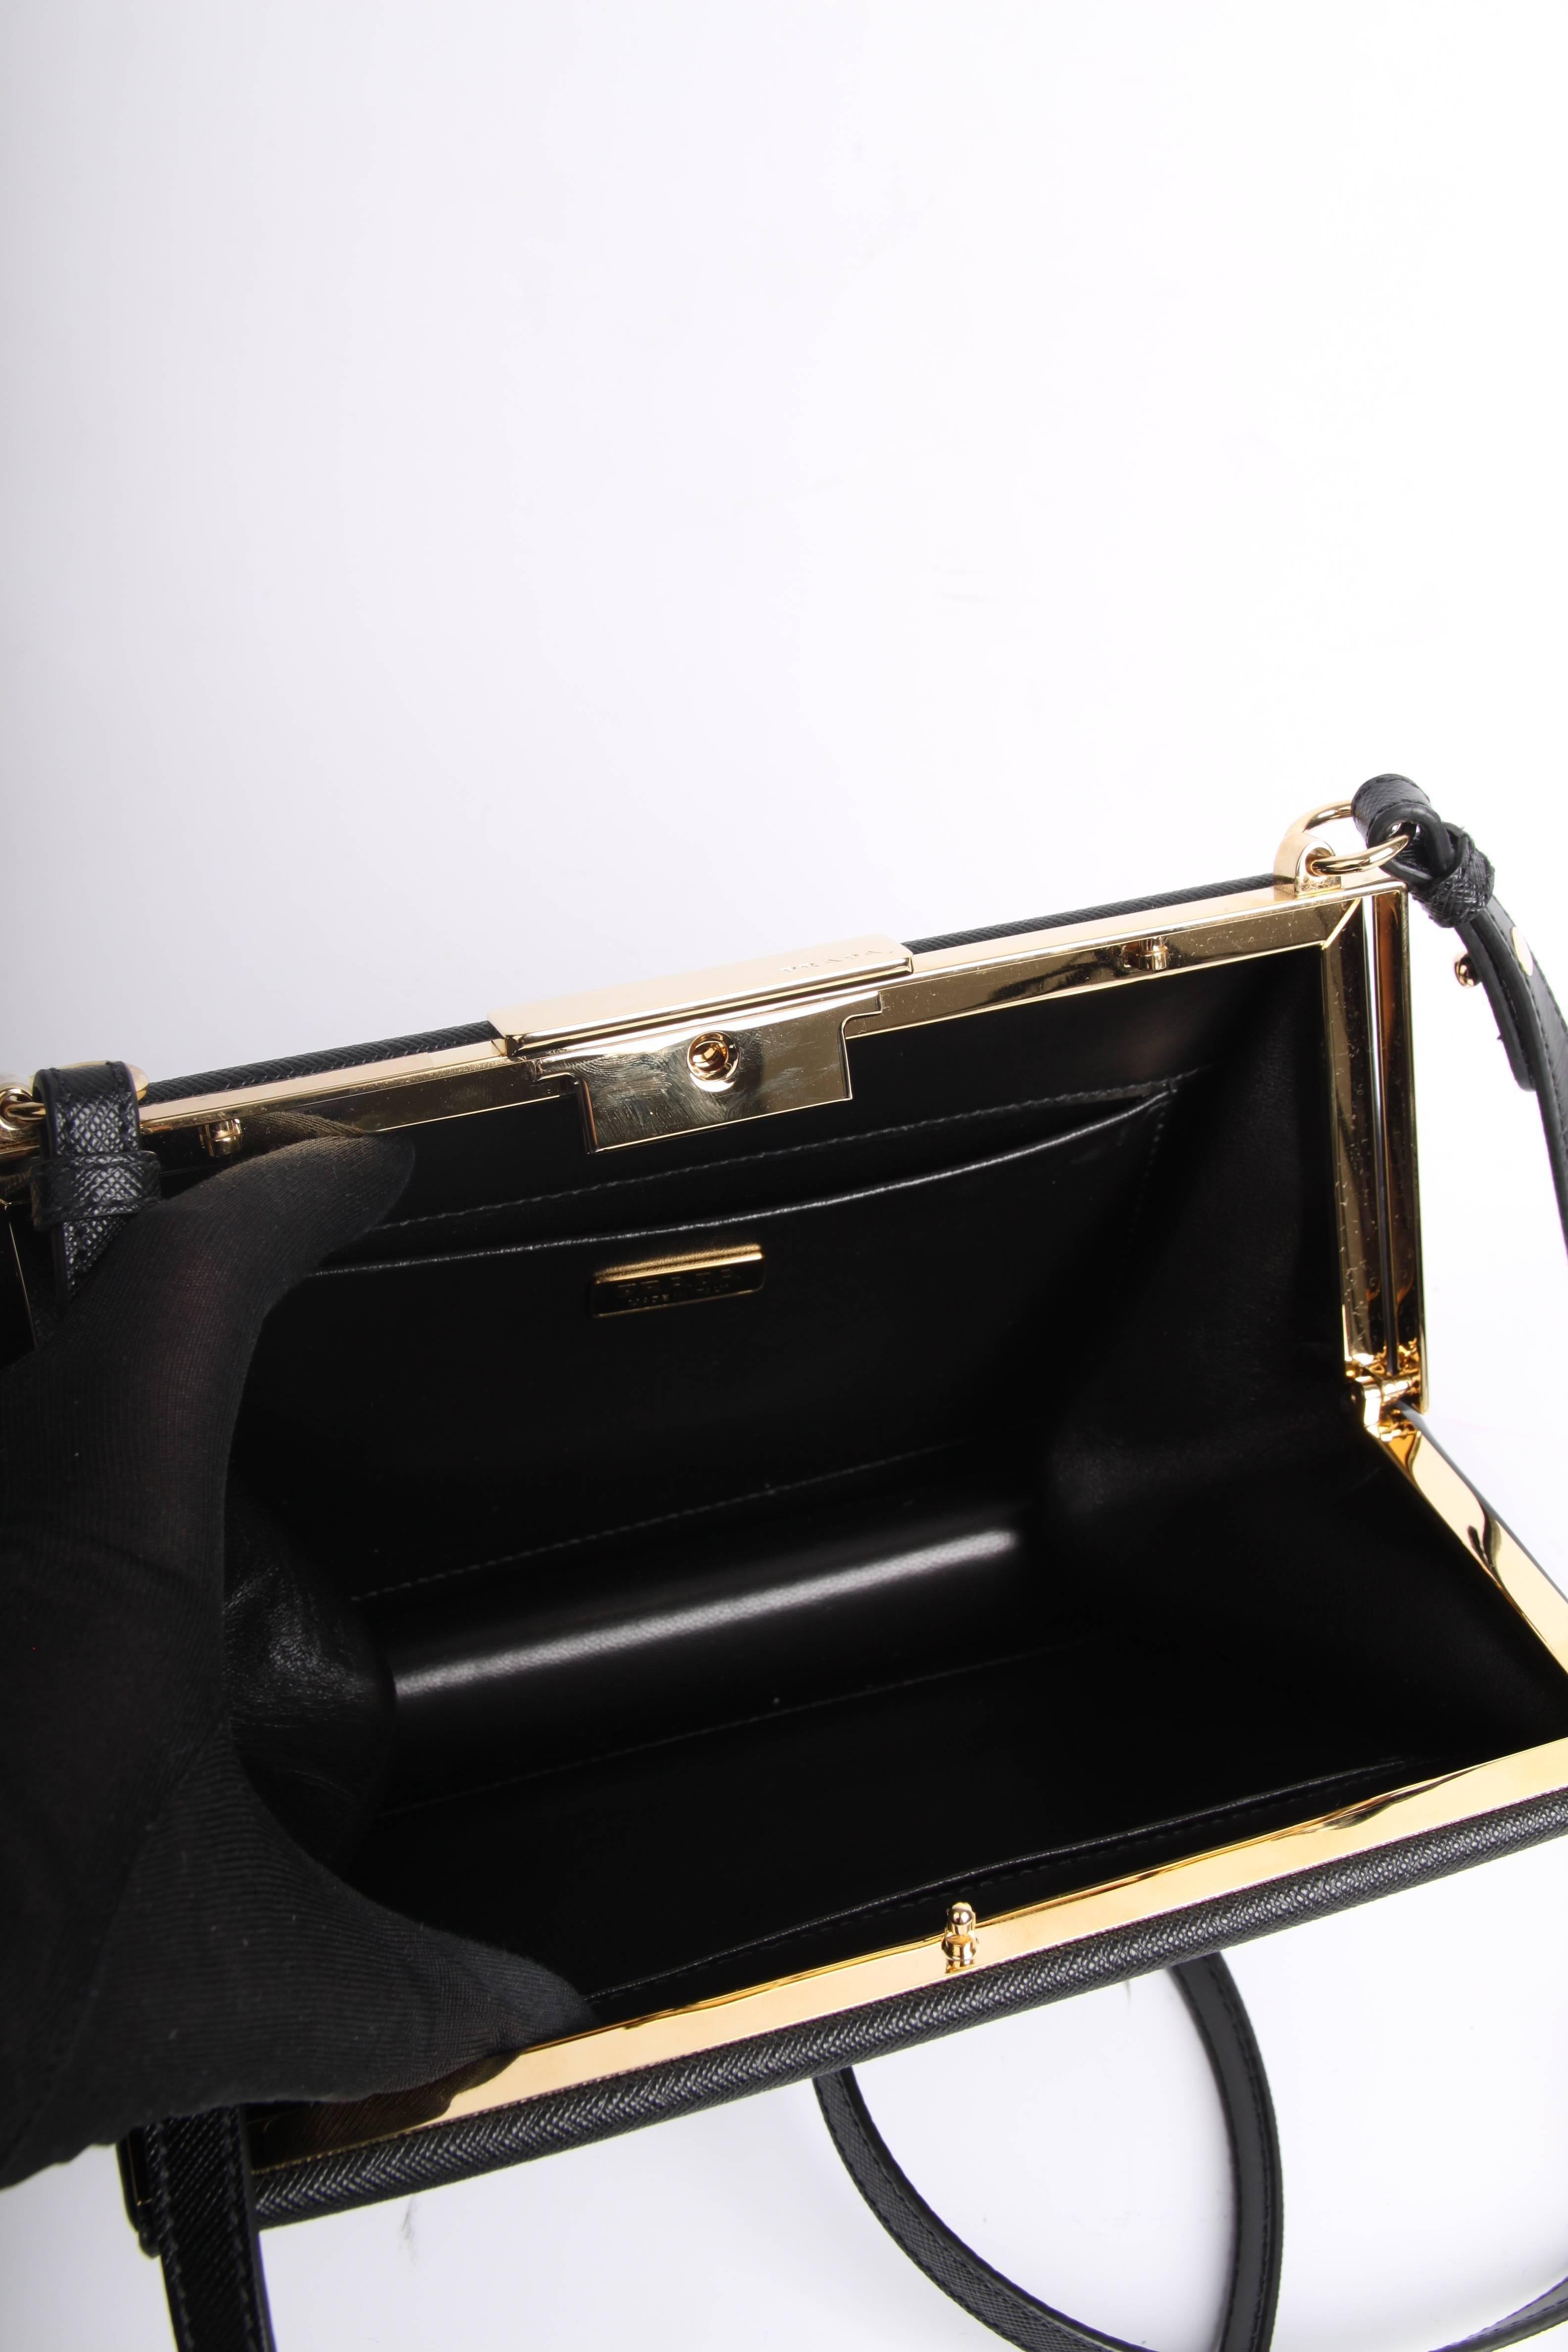 5c8deb5b9b6a Prada Light Frame Saffiano Leather Shoulder Bag - black 2018 at 1stdibs